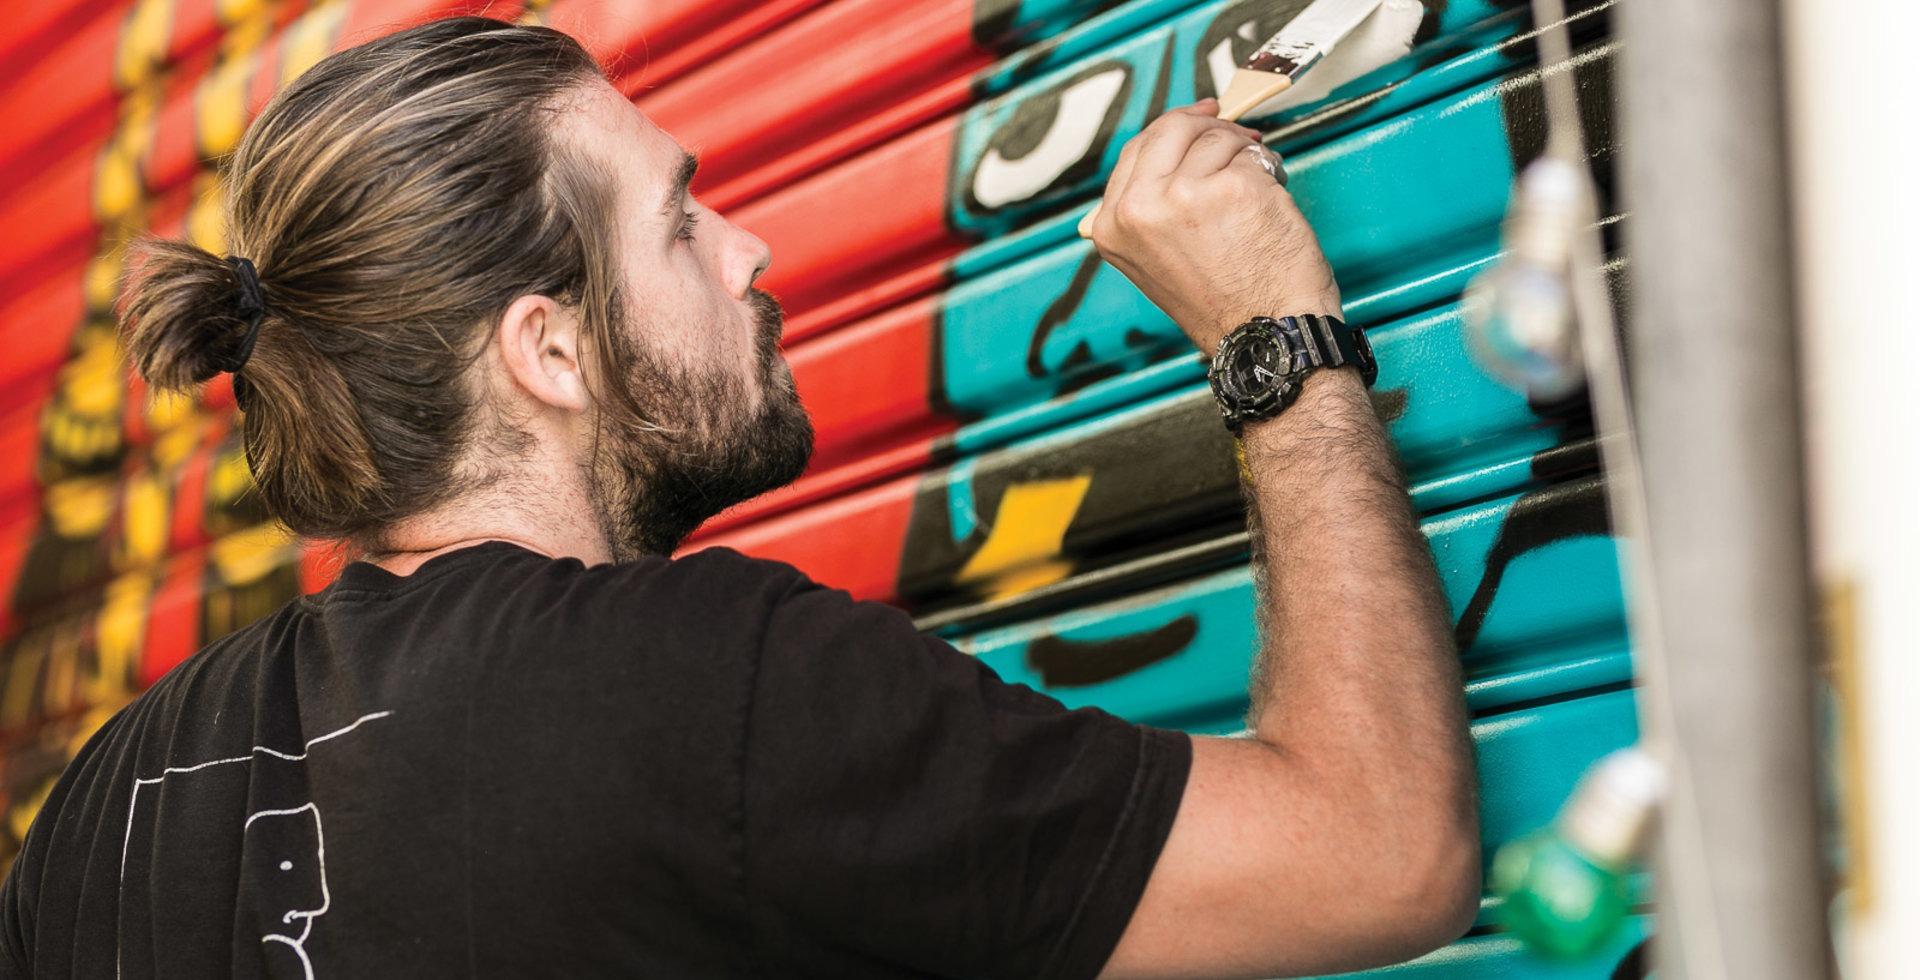 McPherson dials in the details of a mural in Melbourne, Australia. Photo: Leandro Olgiati